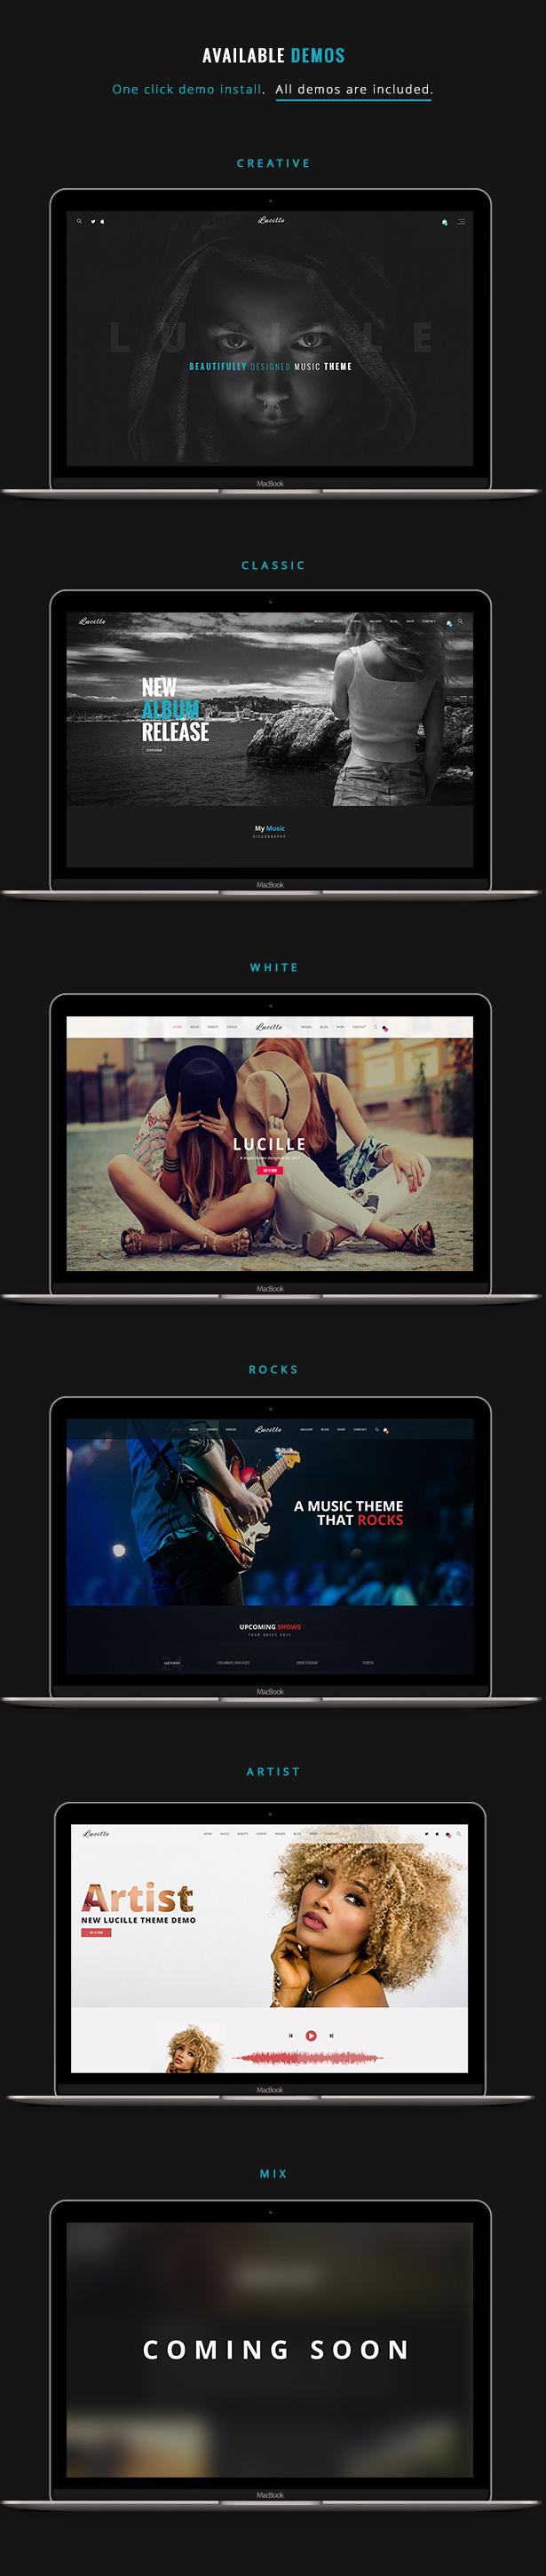 0 3 - Lucille - Music WordPress Theme